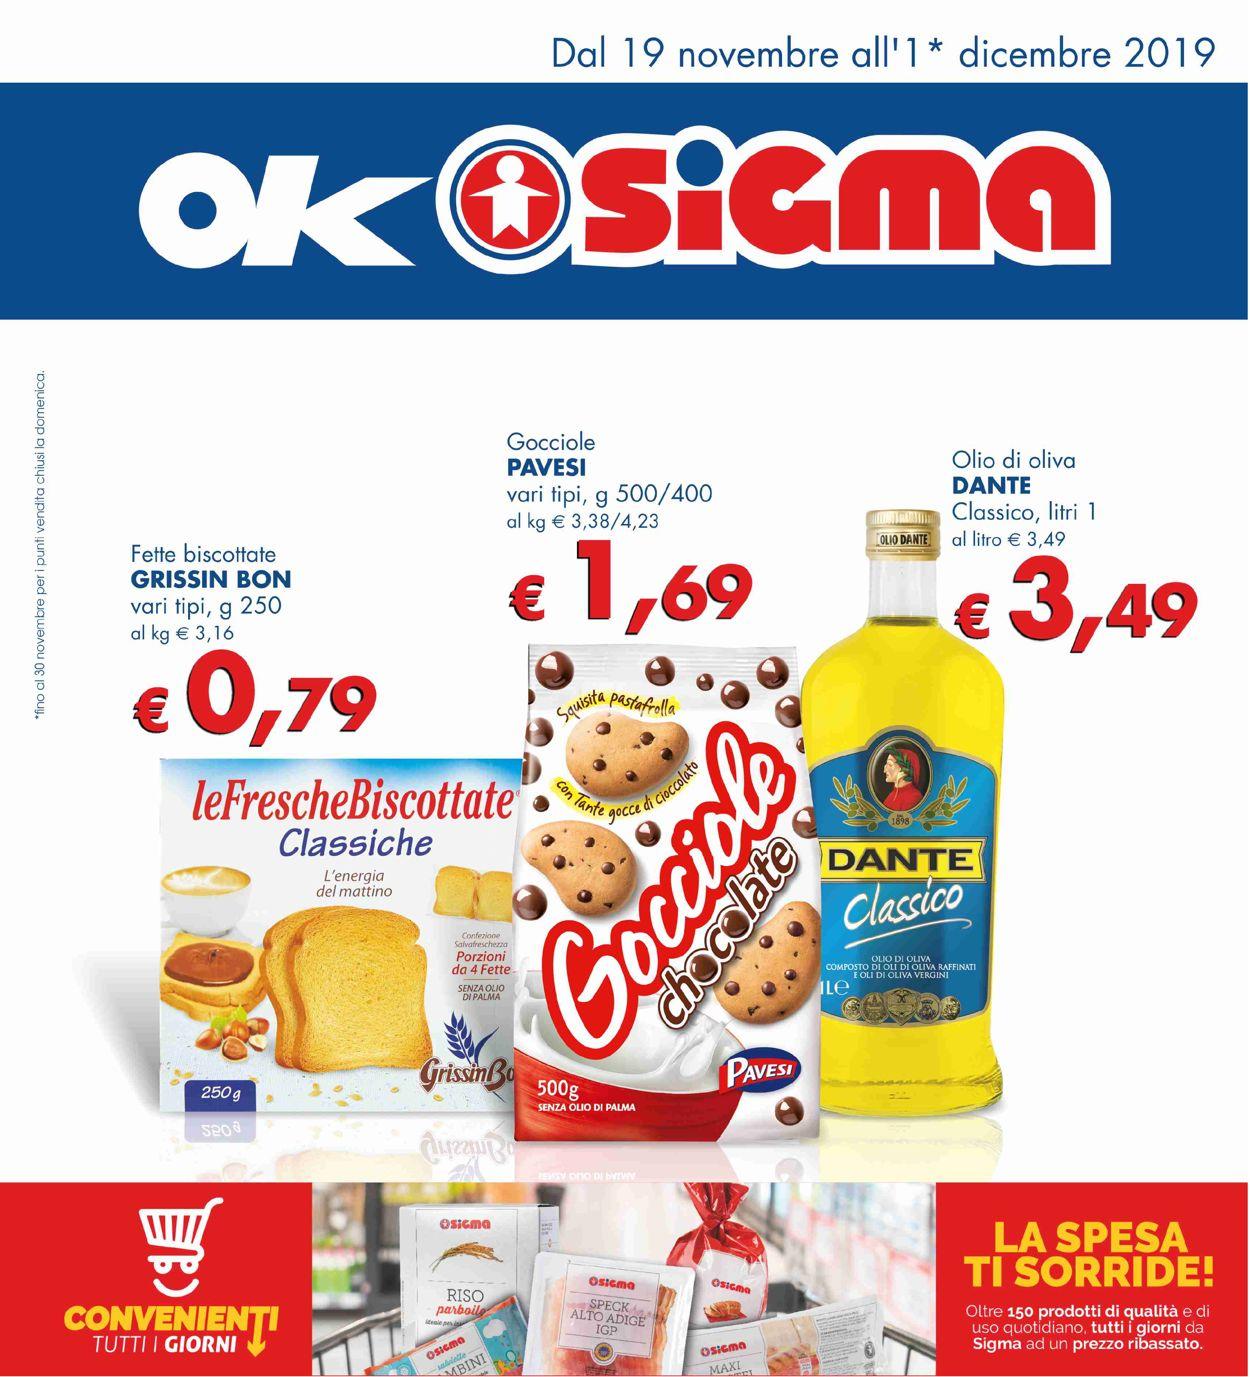 Volantino Sigma - Offerte 19/11-01/12/2019